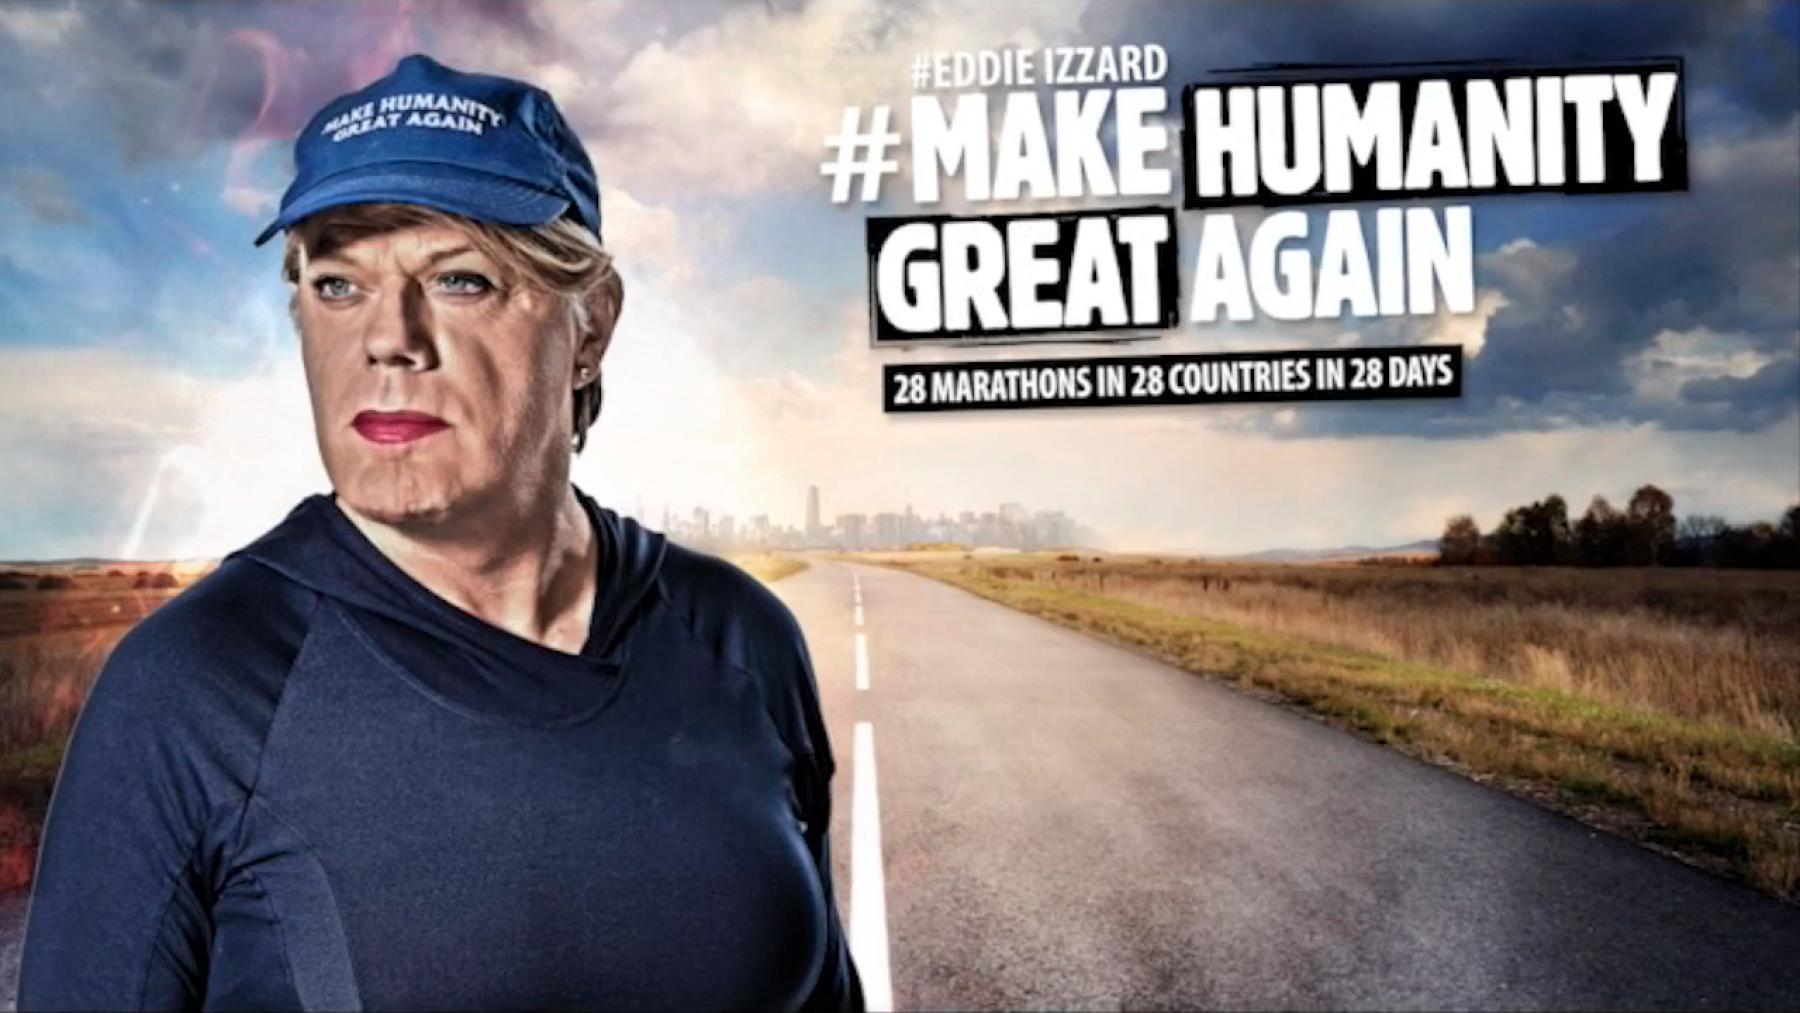 Image for Eddie Izzard undertakes Europe-wide marathon challenge to promote unity